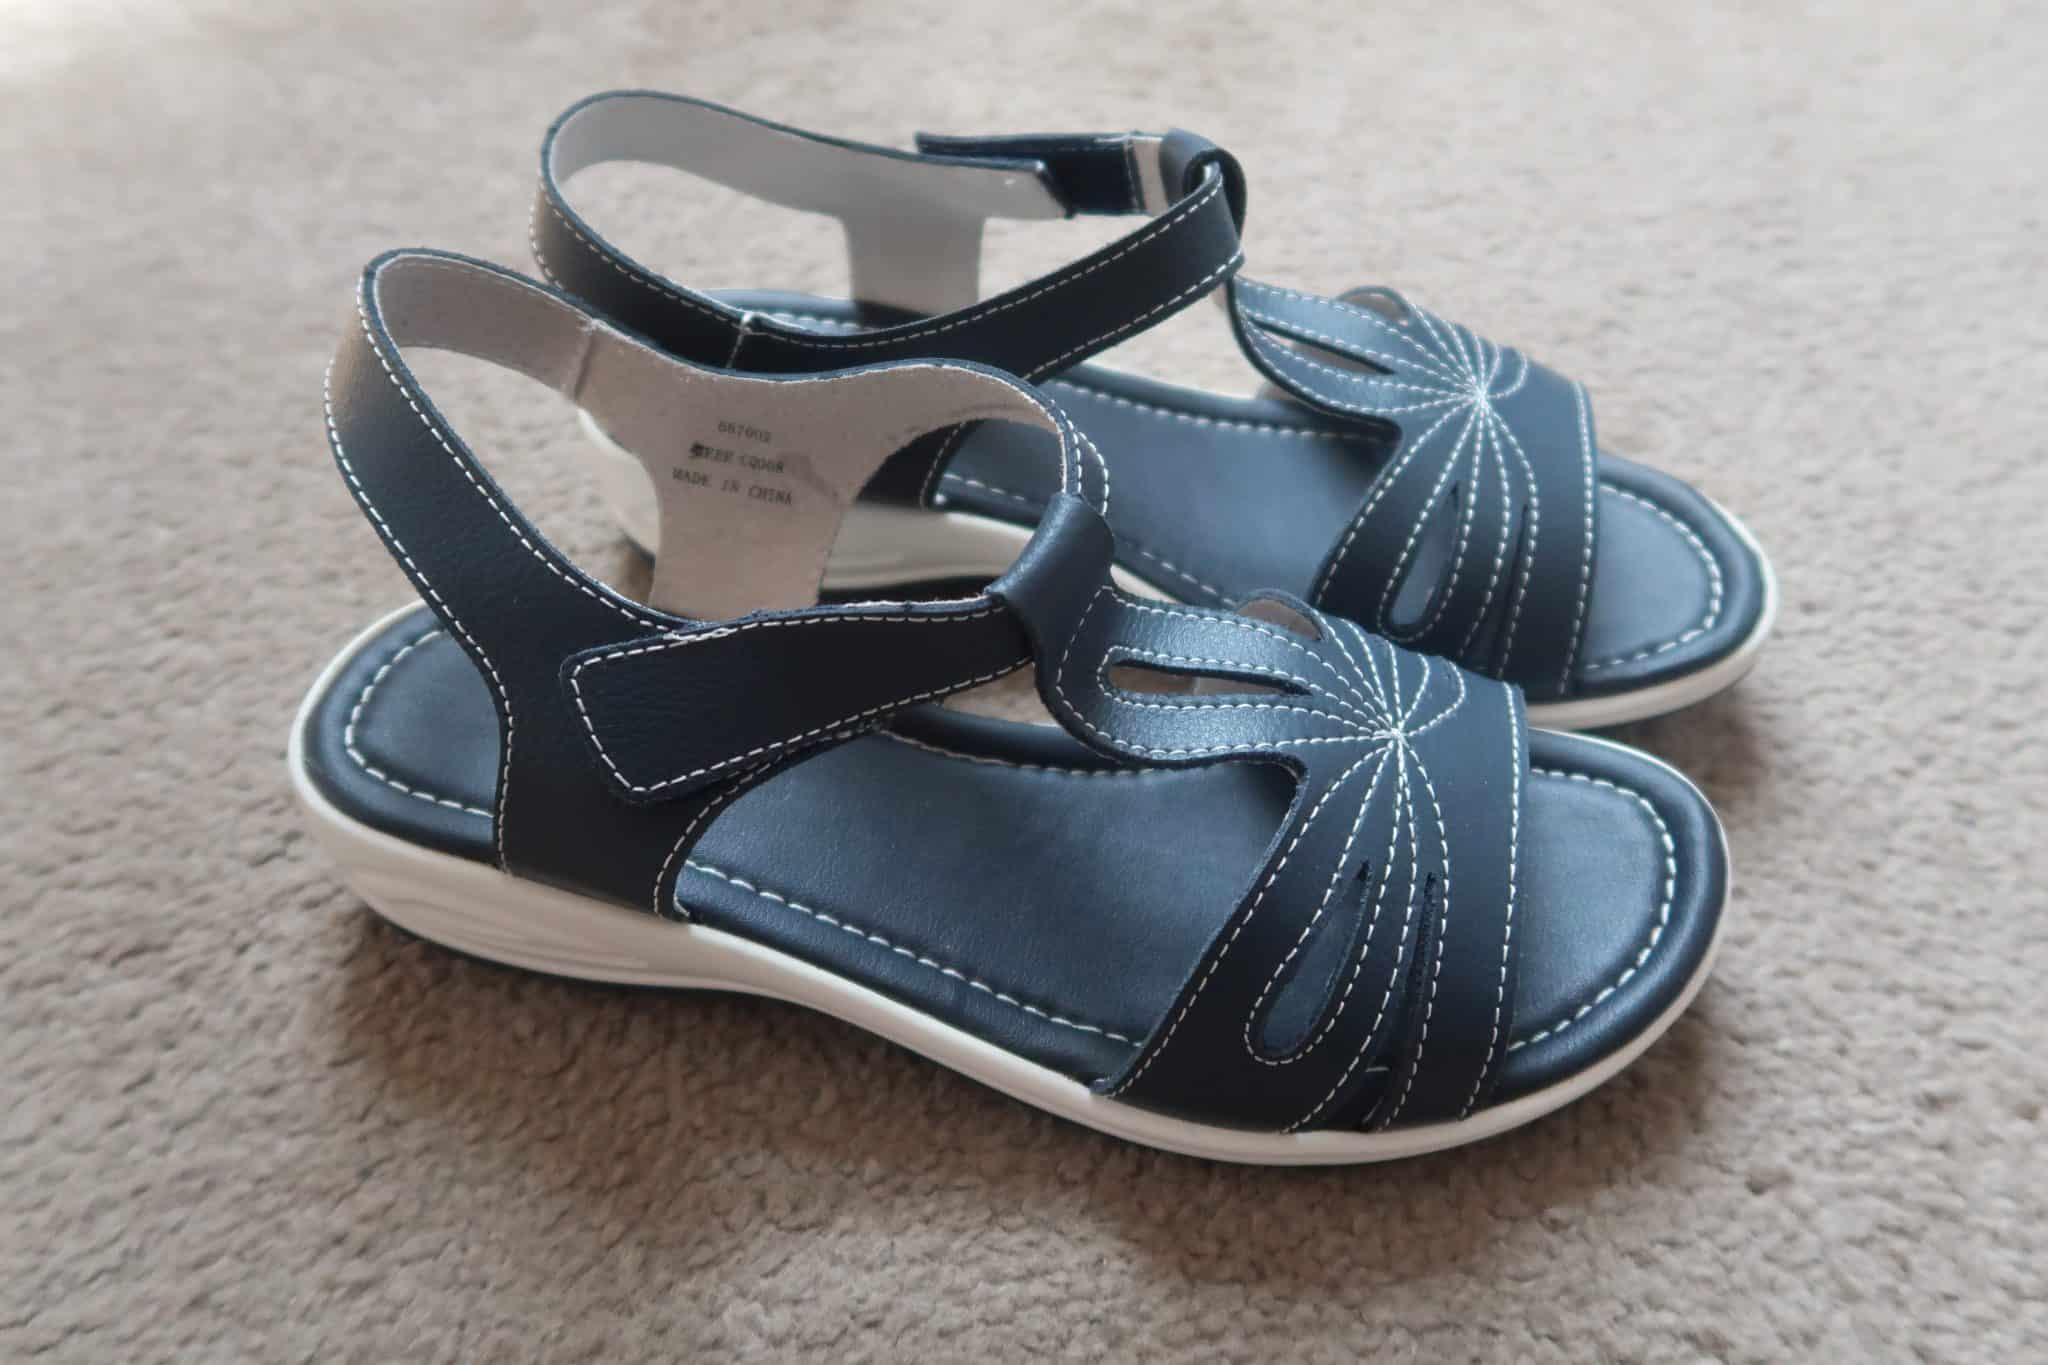 Heavenly Soles T Bar Sandals Extra Wide EEE Fit